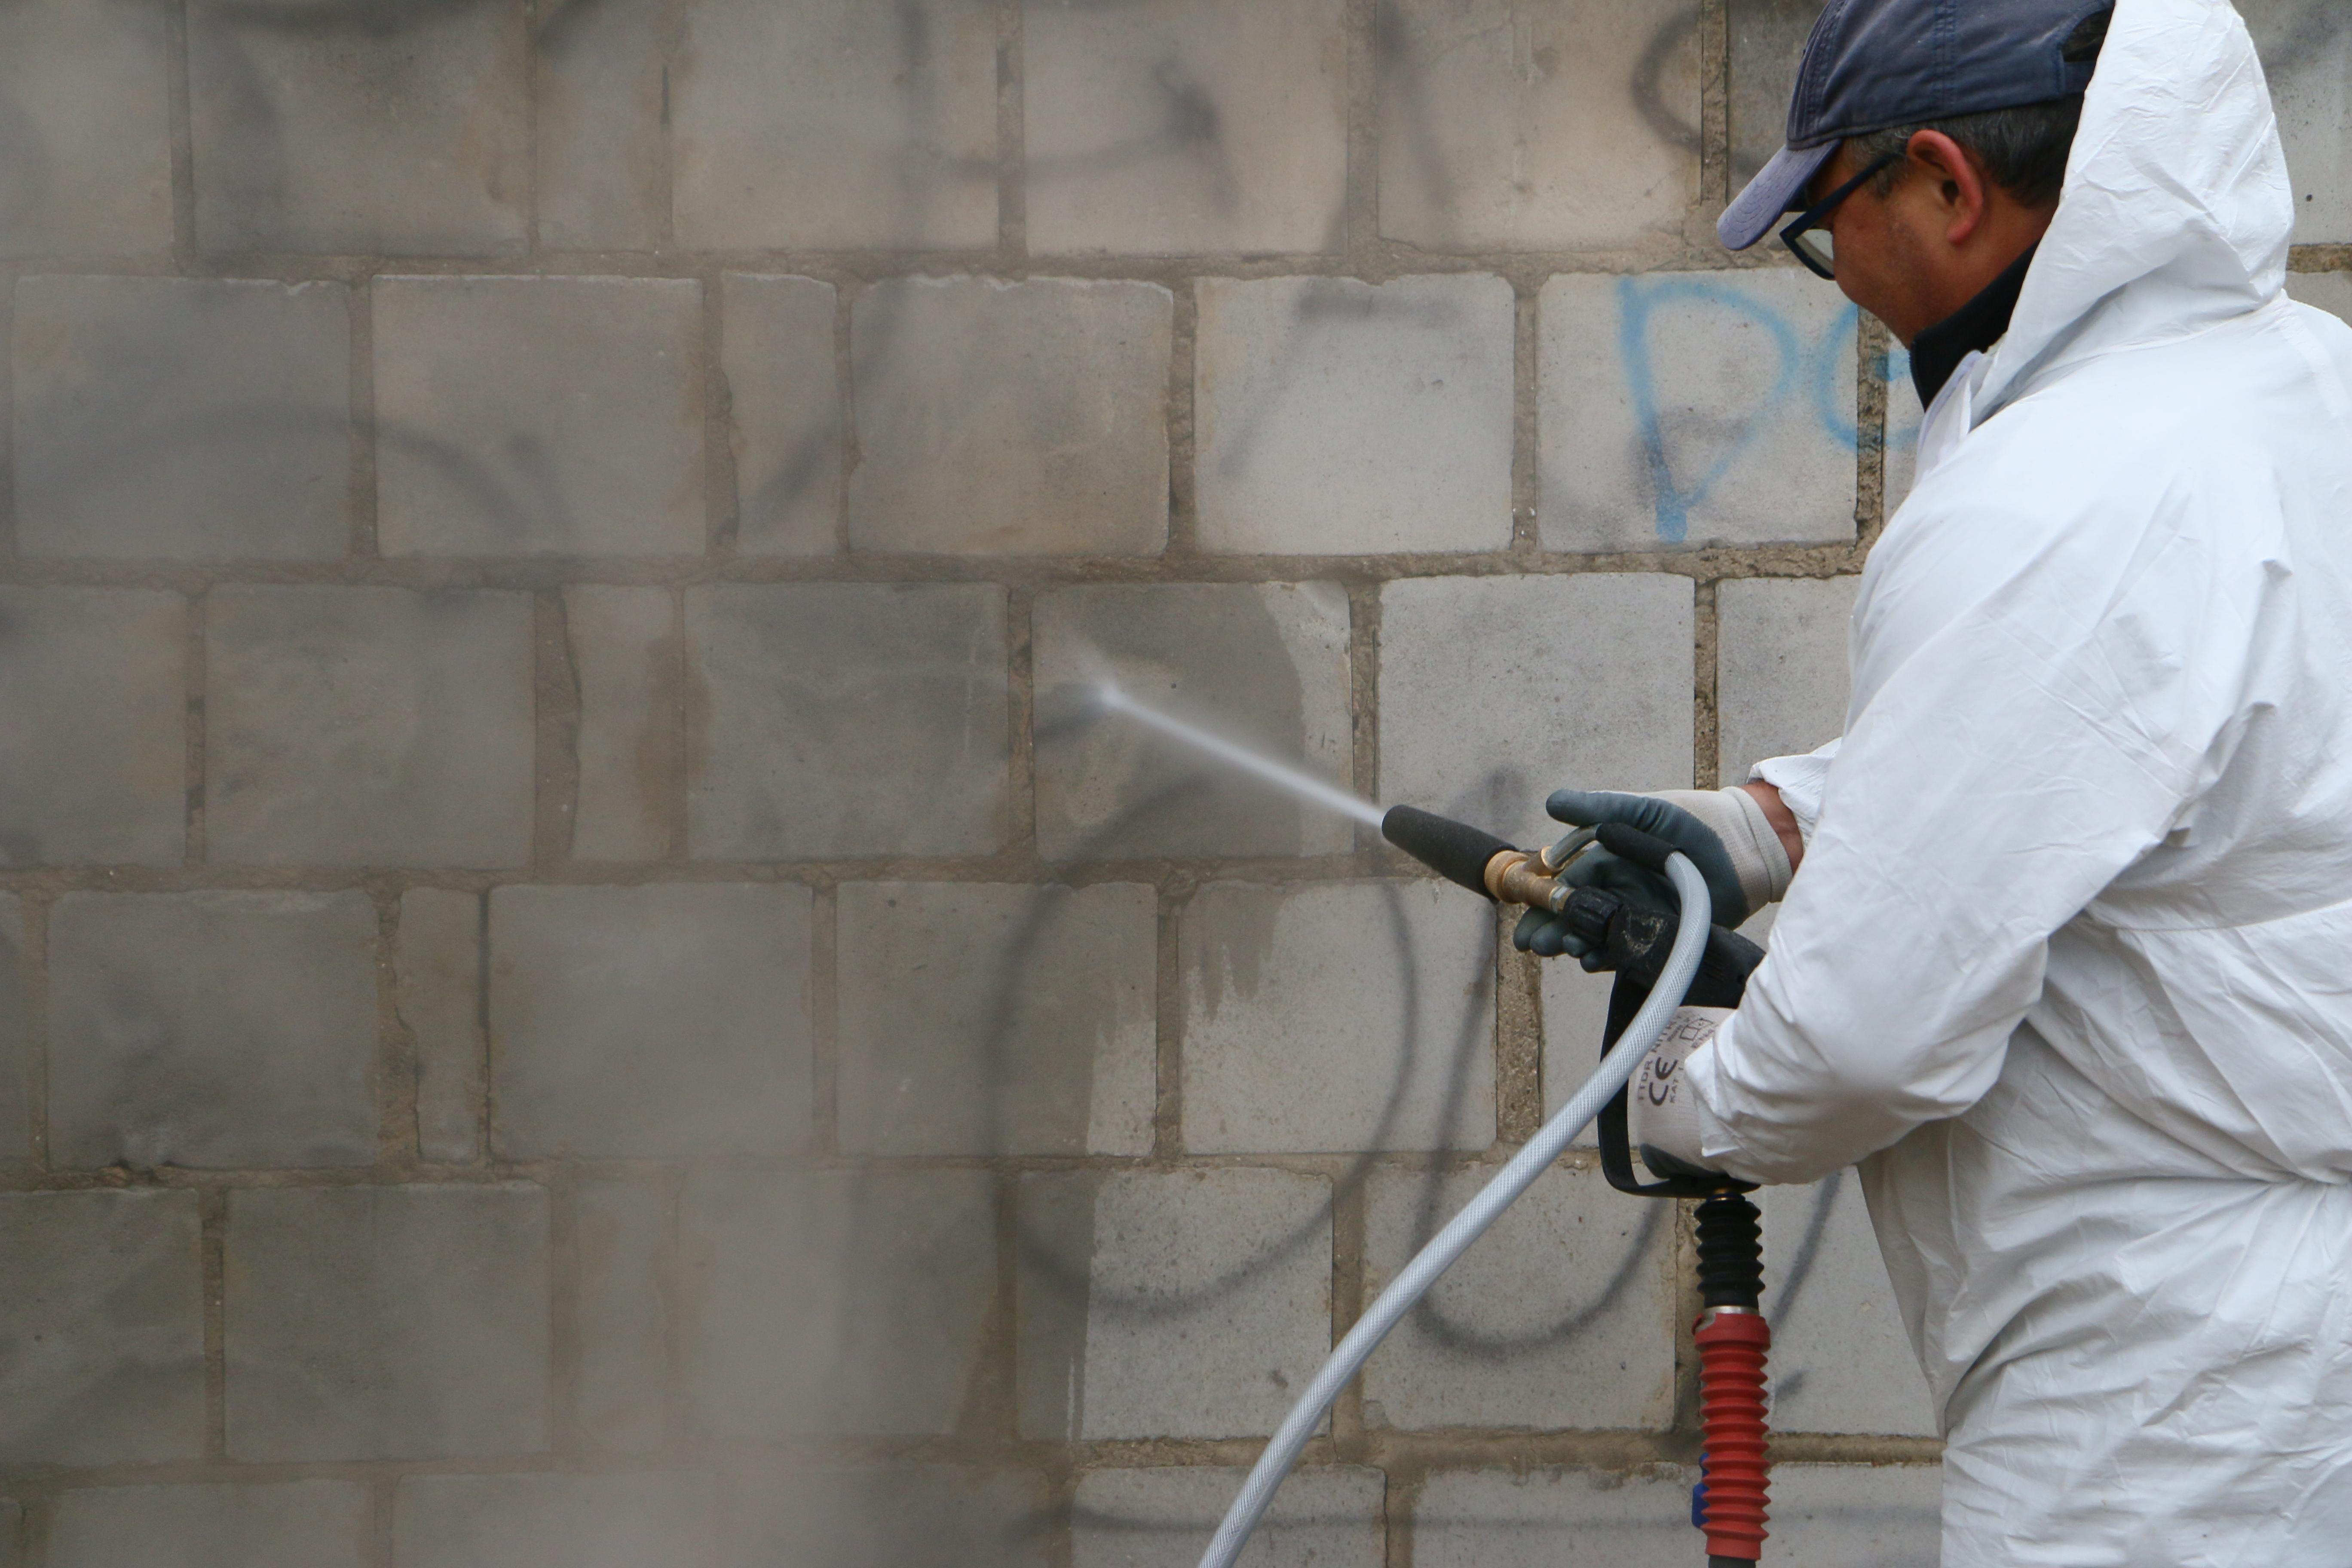 Prezentacja usuwania graffiti